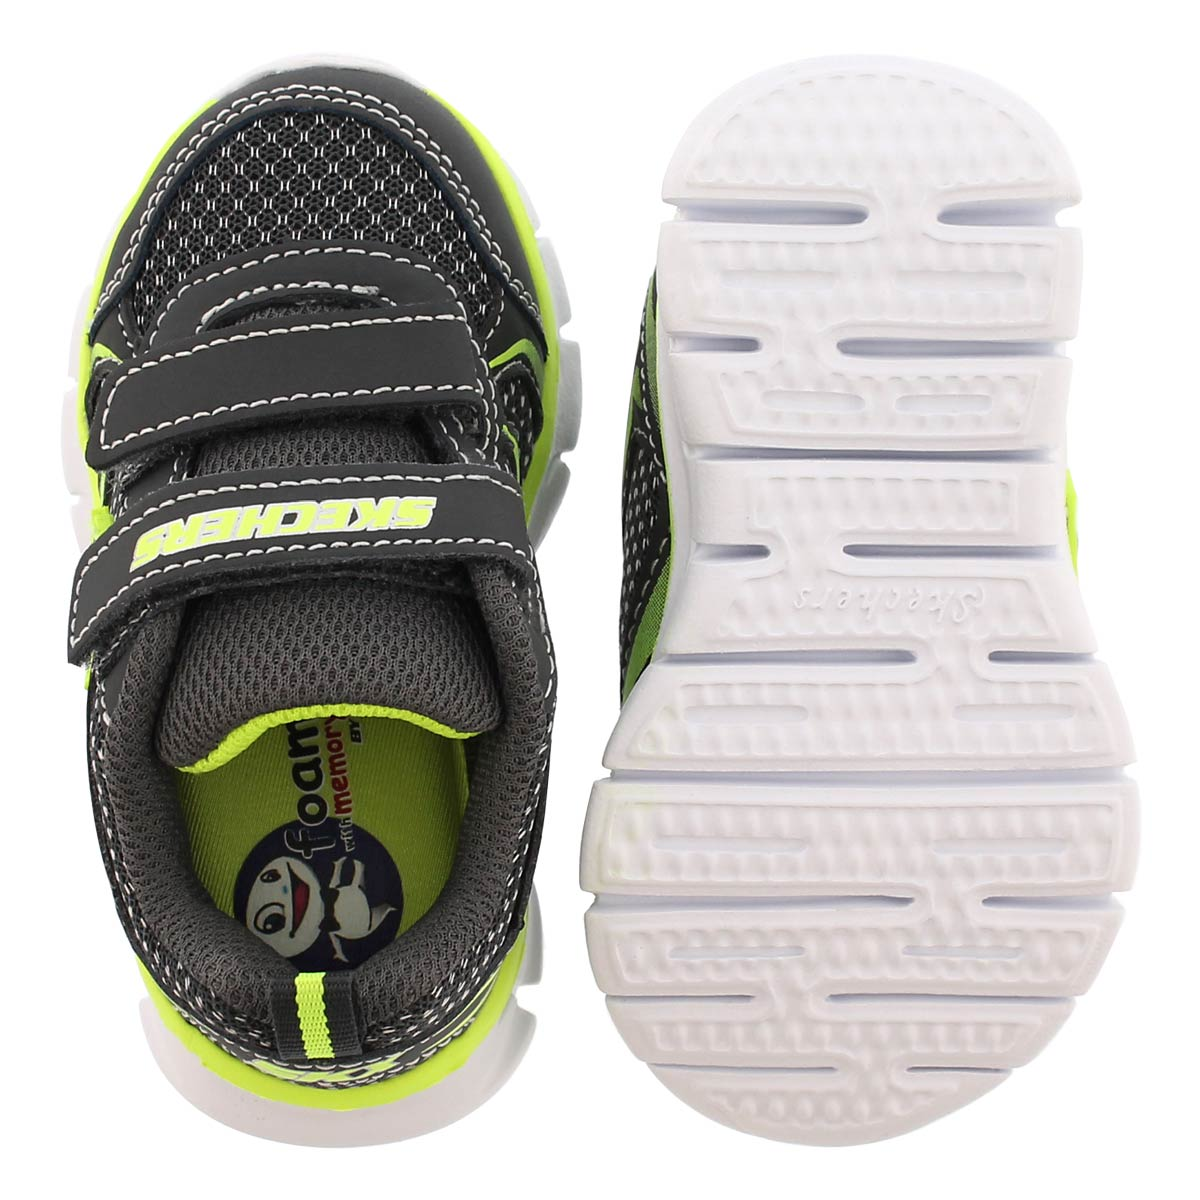 Inf Mini Sprint char/lime 2 strp sneaker